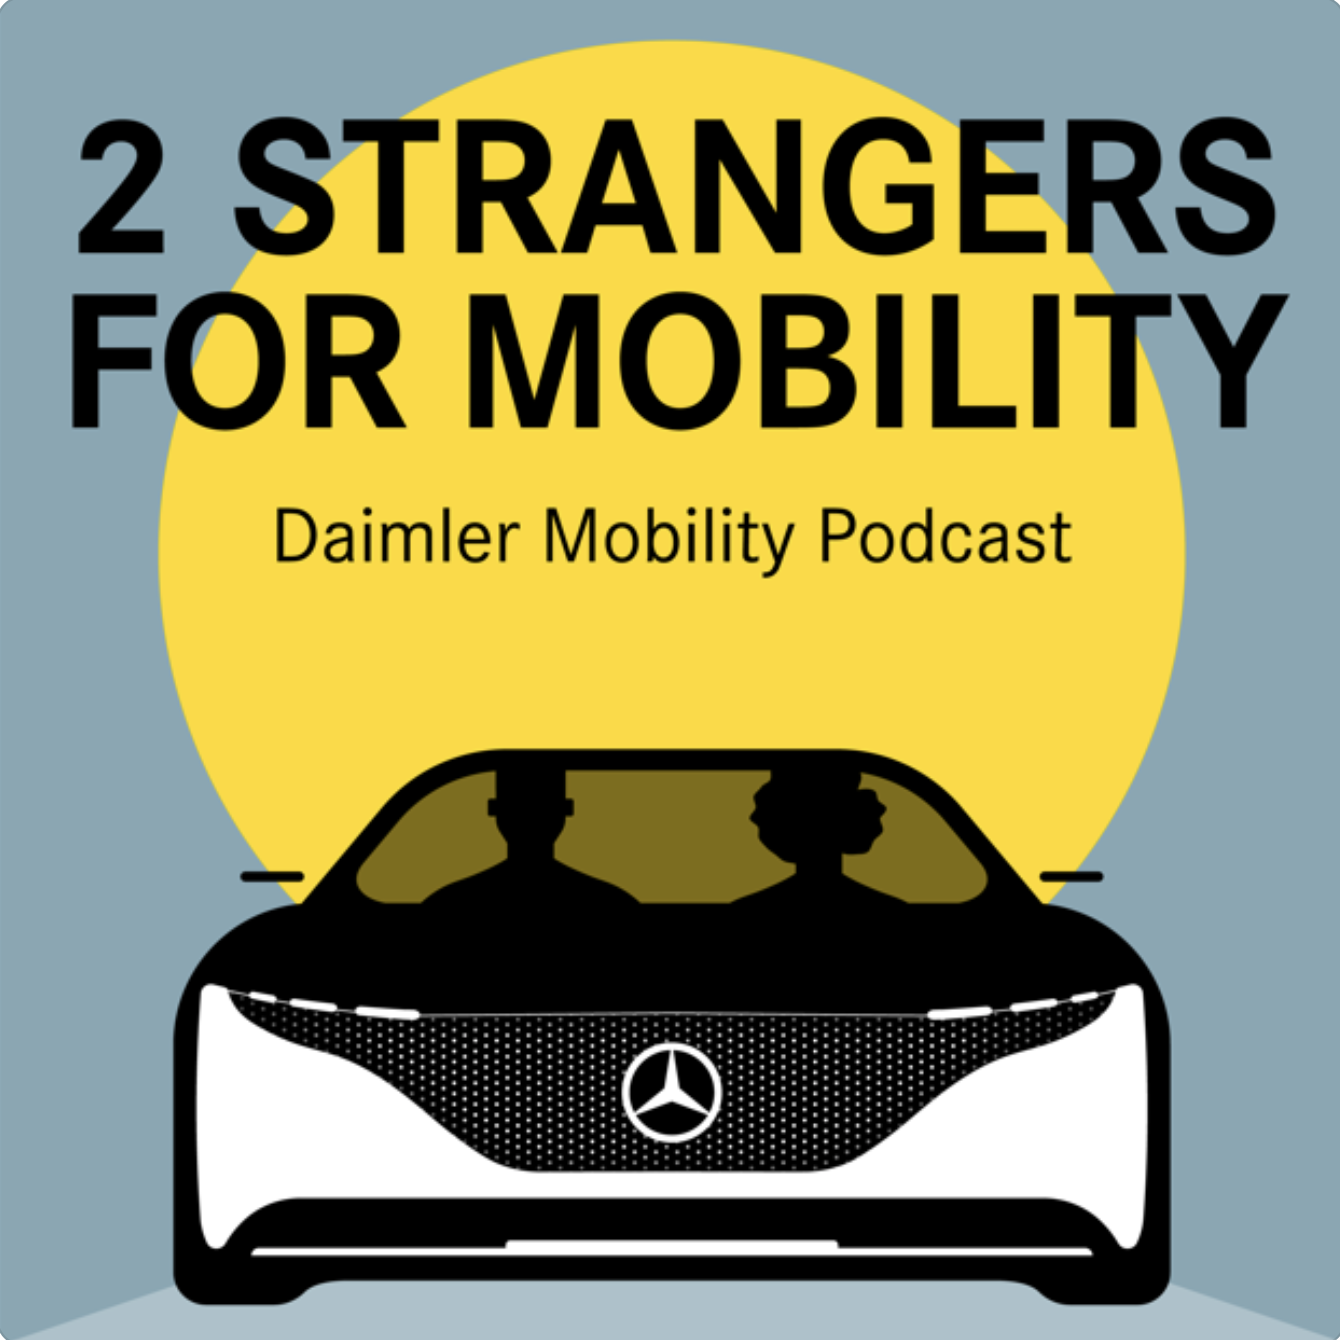 Podcast Produktion - Daimler - 2 Strangers for Mobility